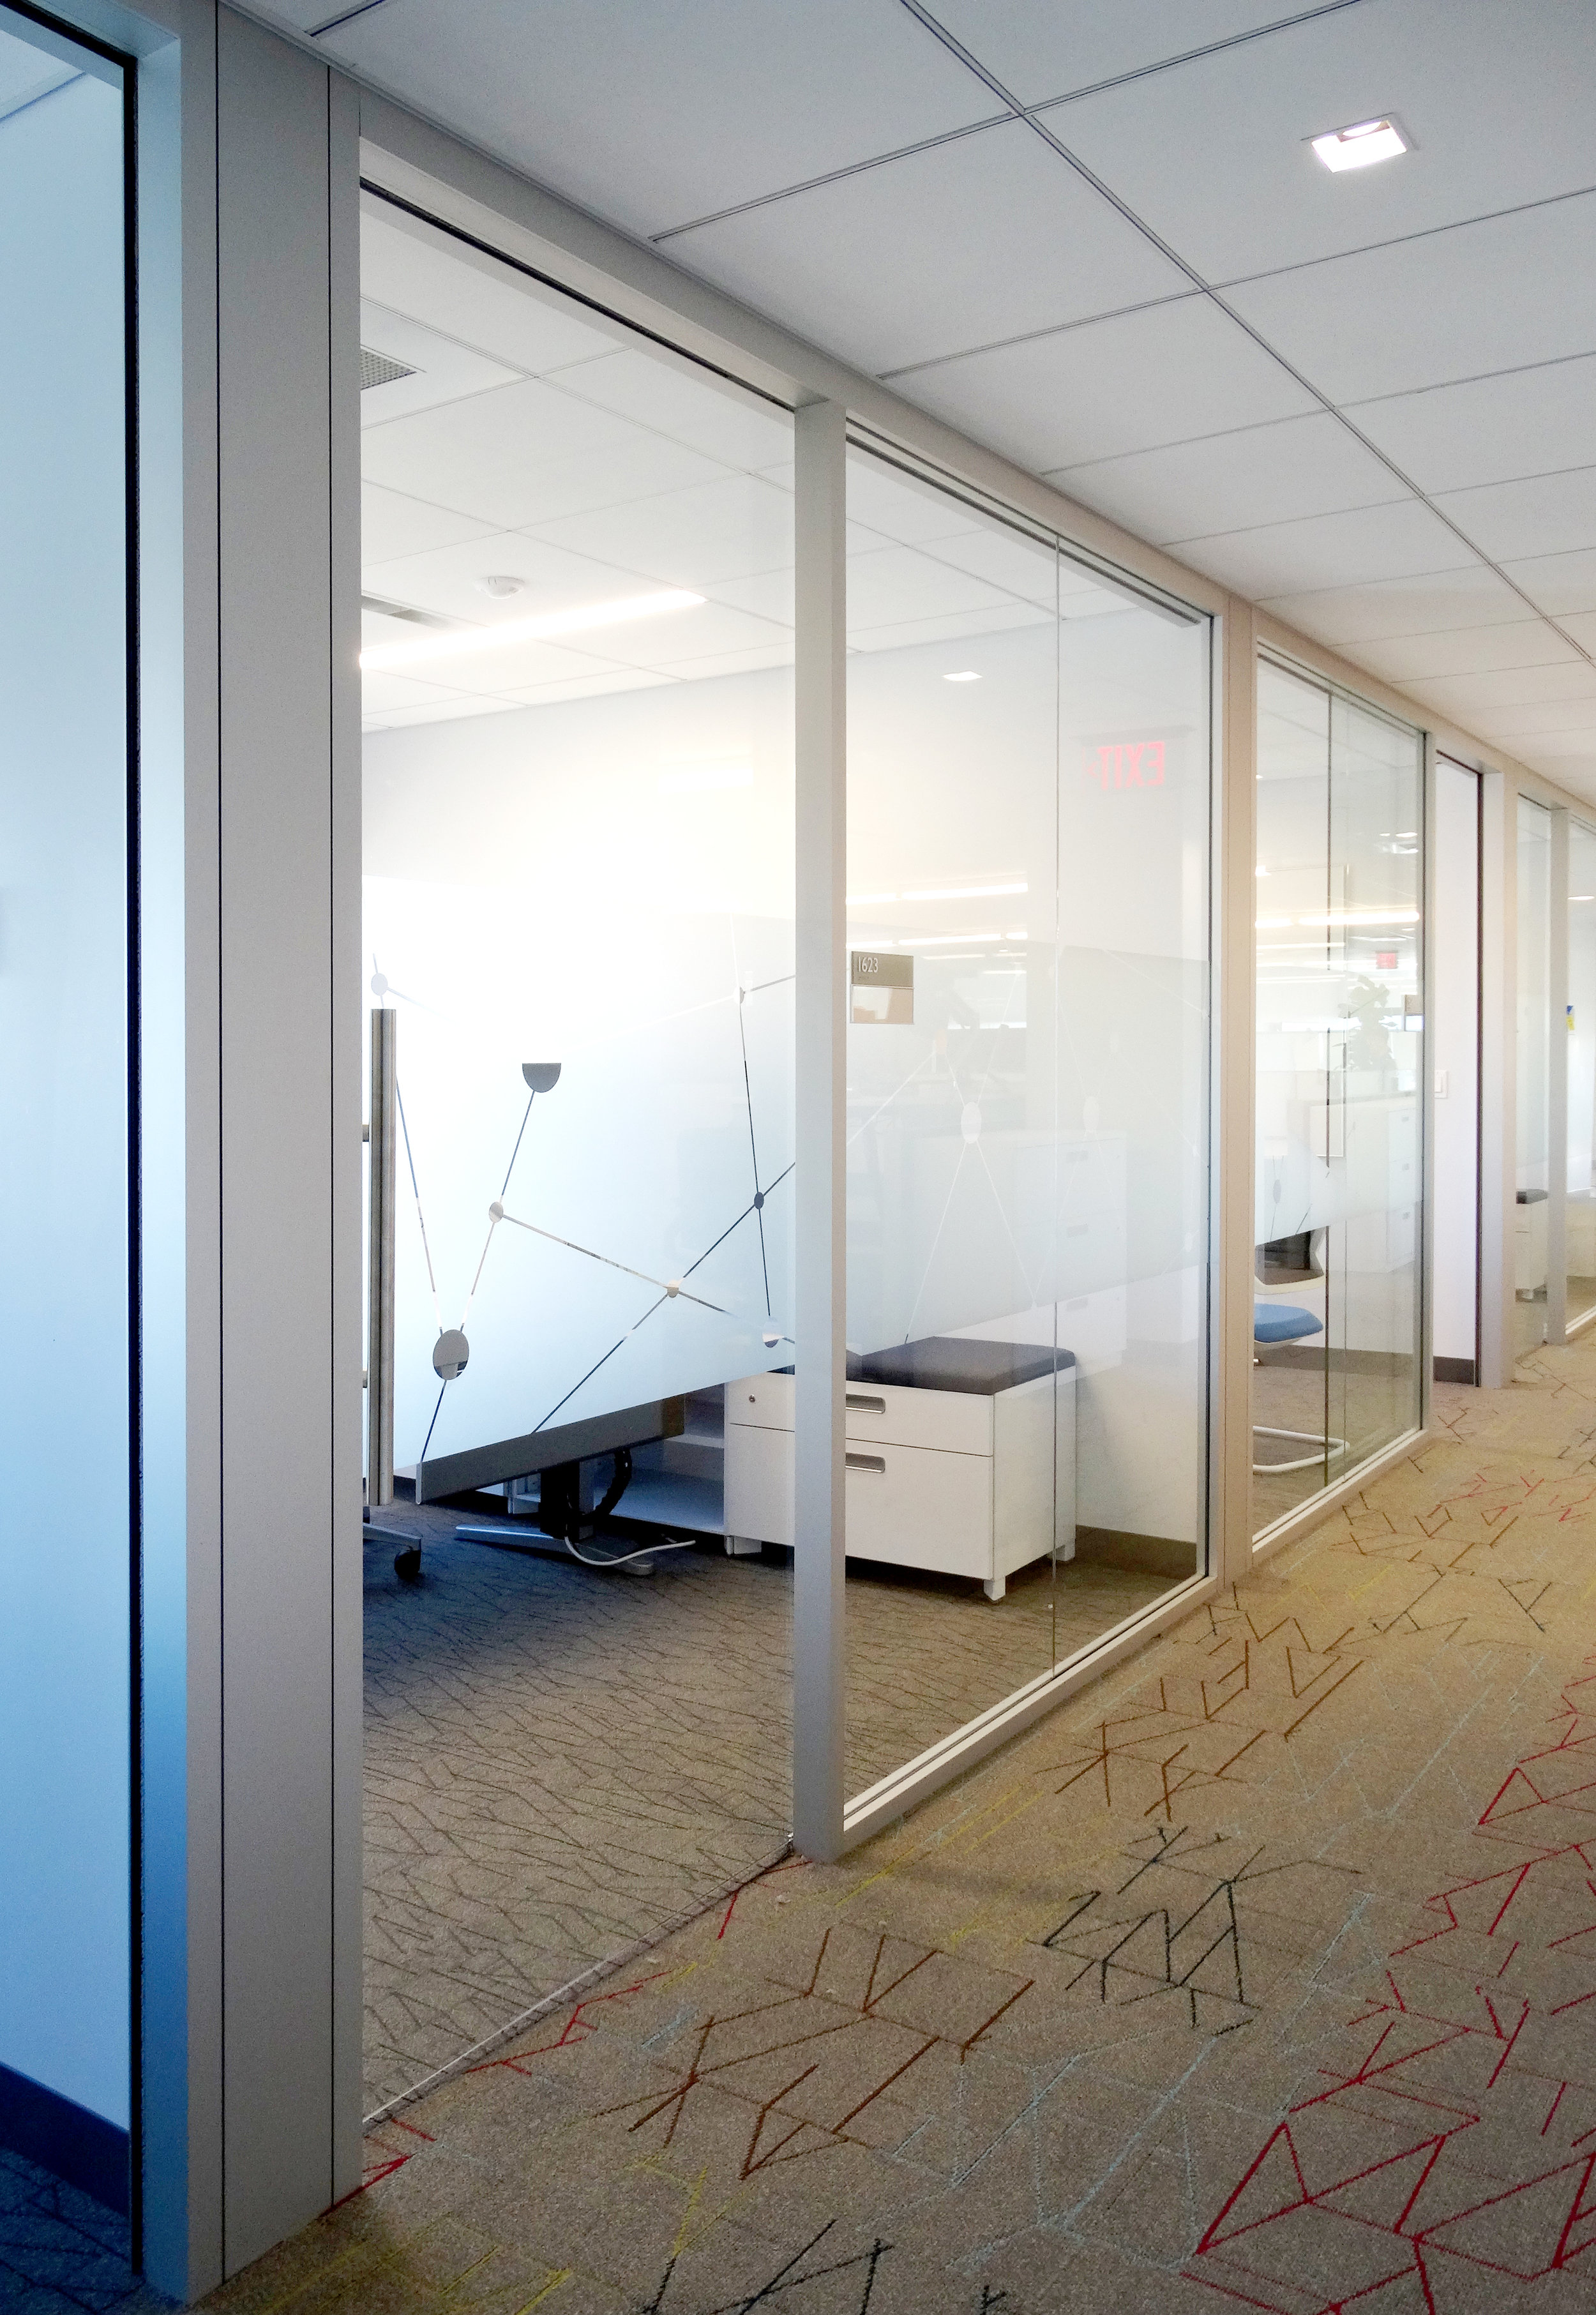 Litespace Glass Office Wall Frameless Glass Sliding Door - Spaceworks AI.jpg